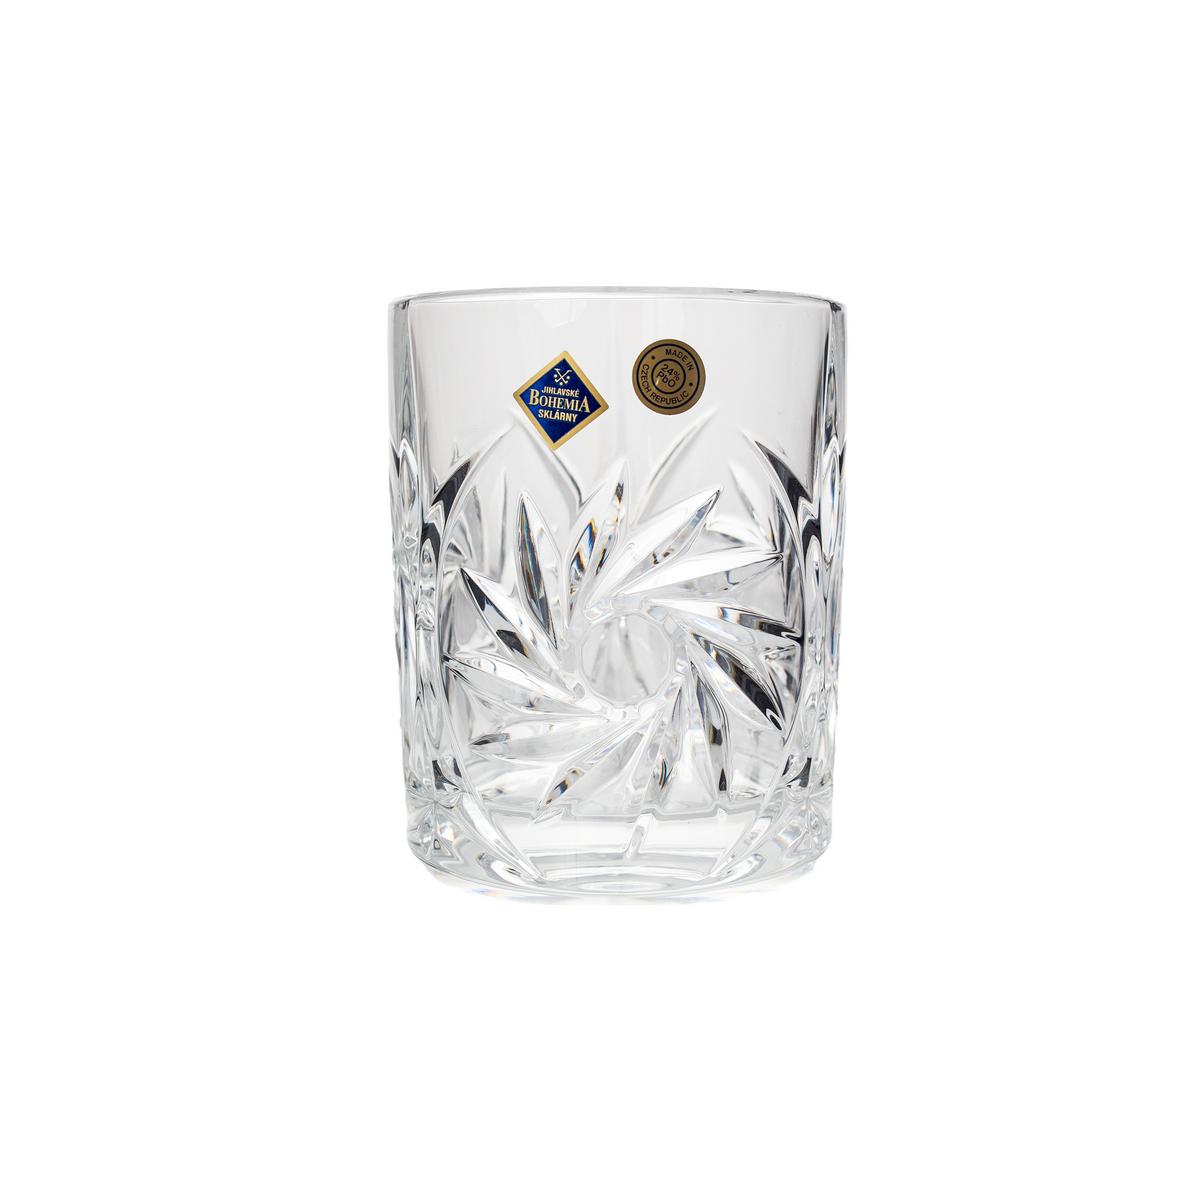 Pinwheel Set 6 Pahare Cristal Whisky 360 Ml 2021 aranjareamesei.ro